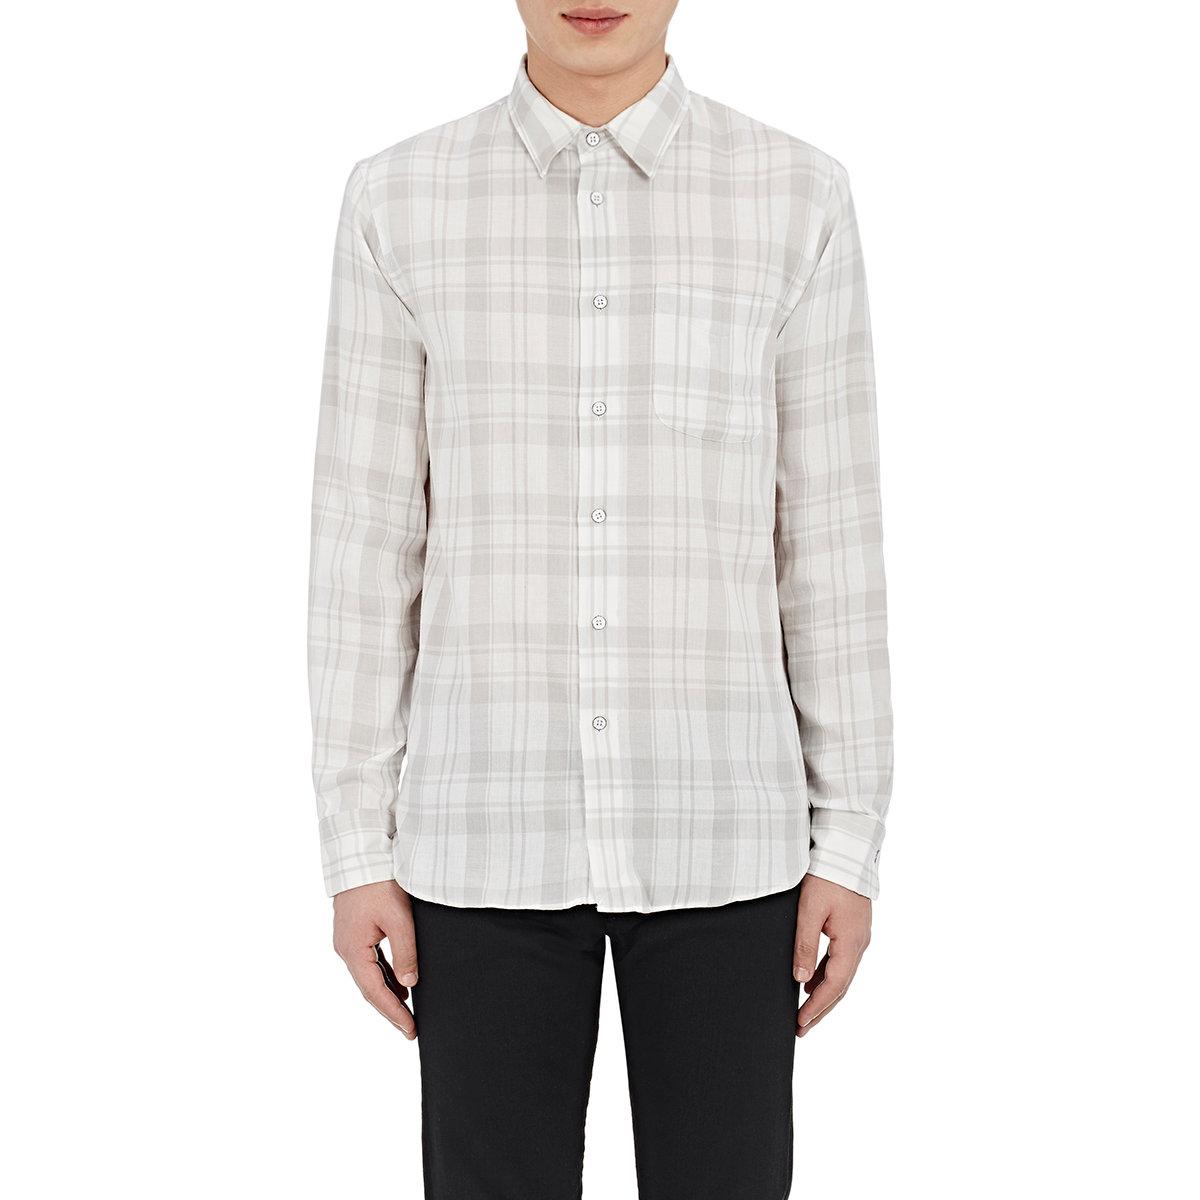 Rag bone plaid yokohama shirt in gray for men lyst for Rag bone shirt